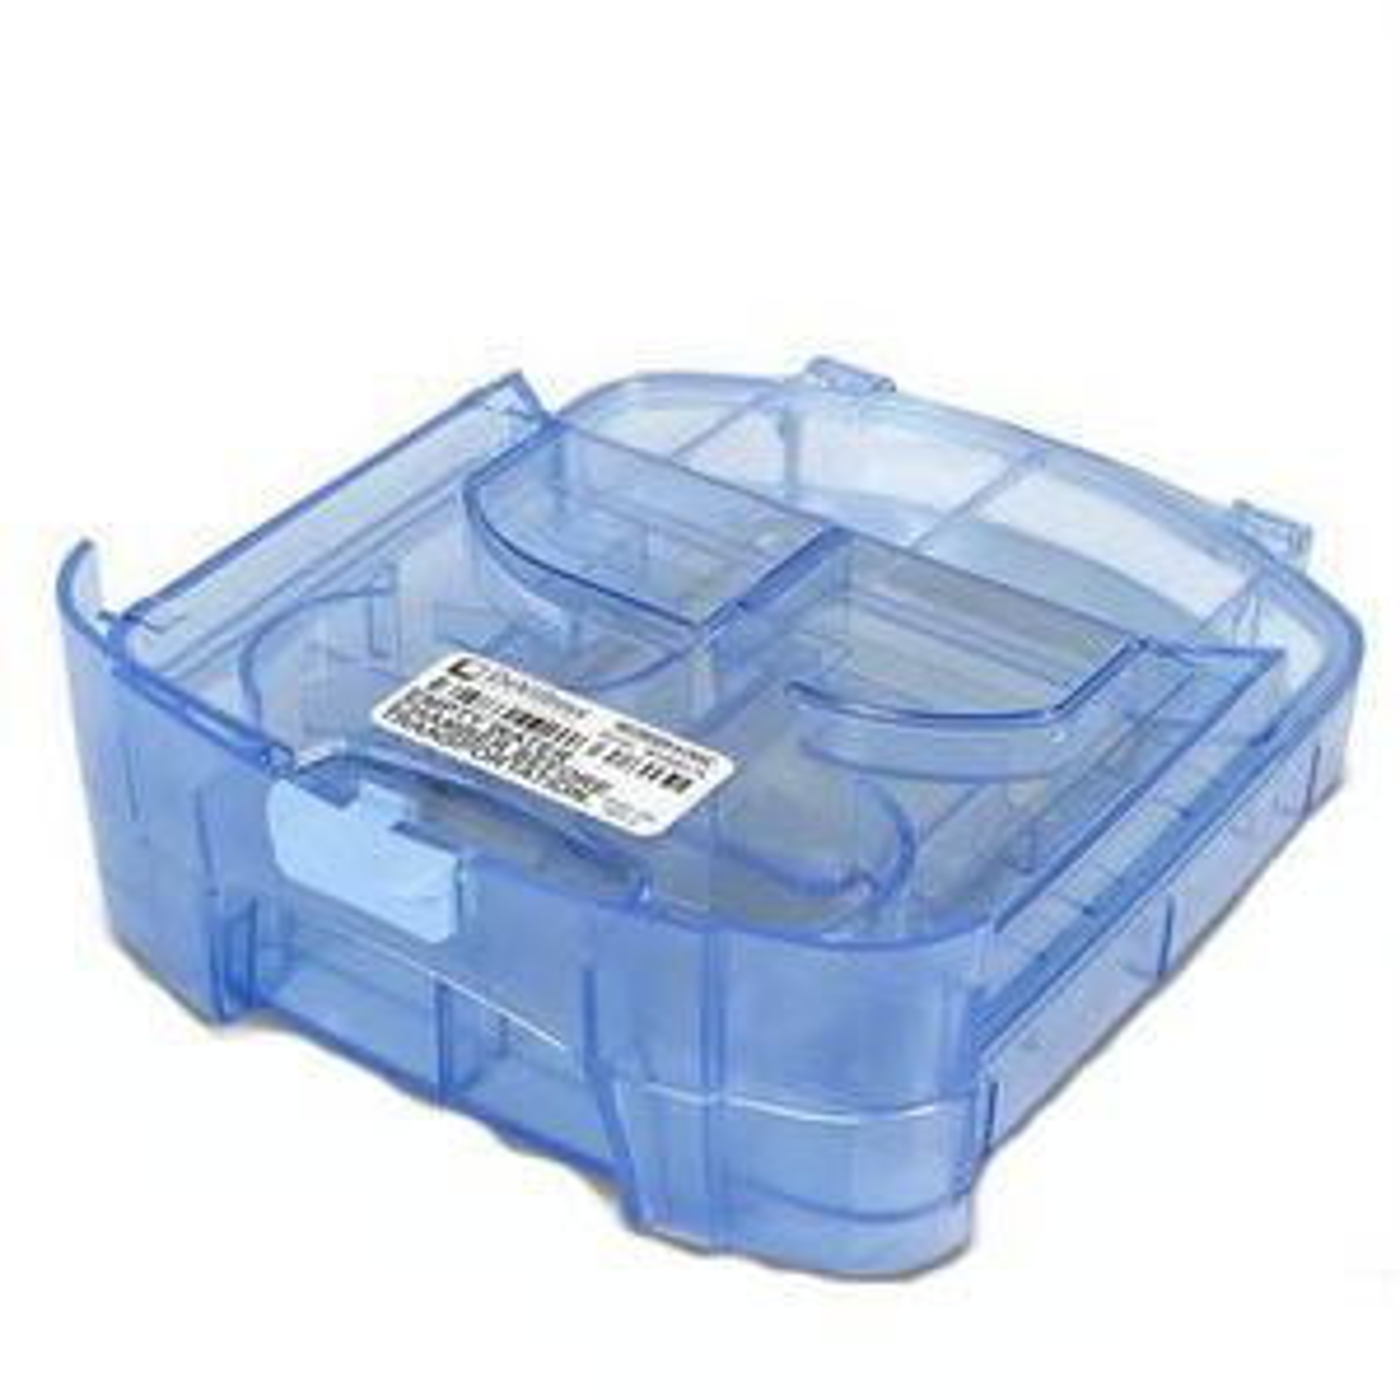 DeVilbiss Intellipap Heated Humidifier Chamber